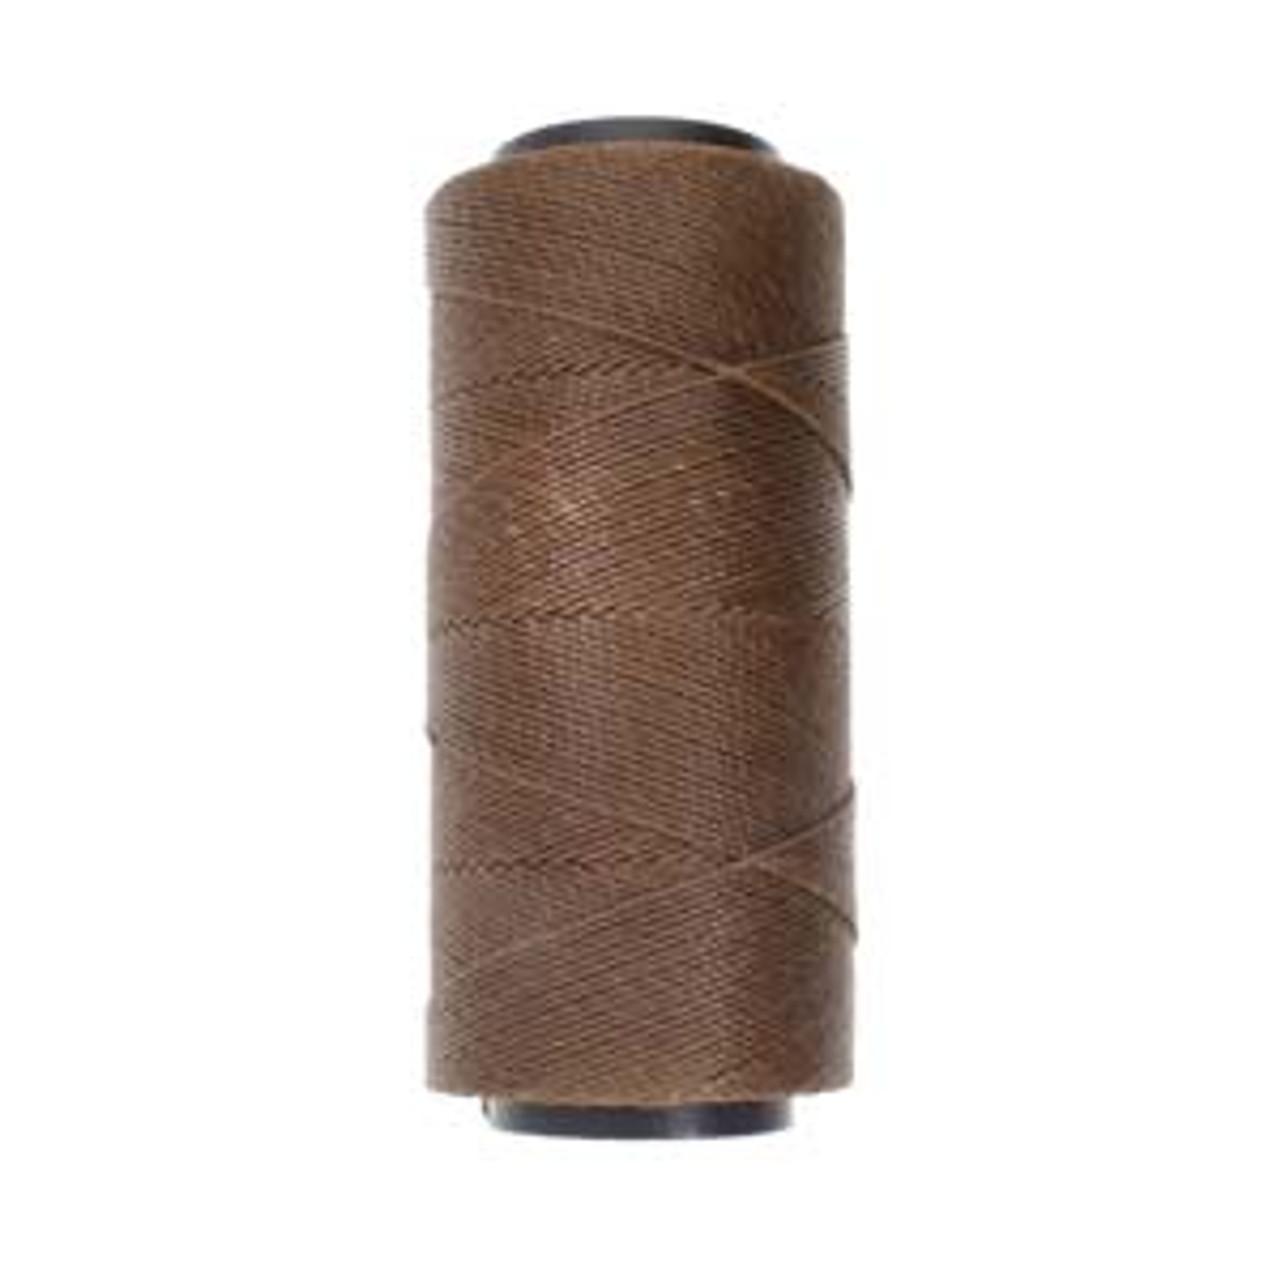 6yds 2 ply Brown Waxed Brazilian Cord